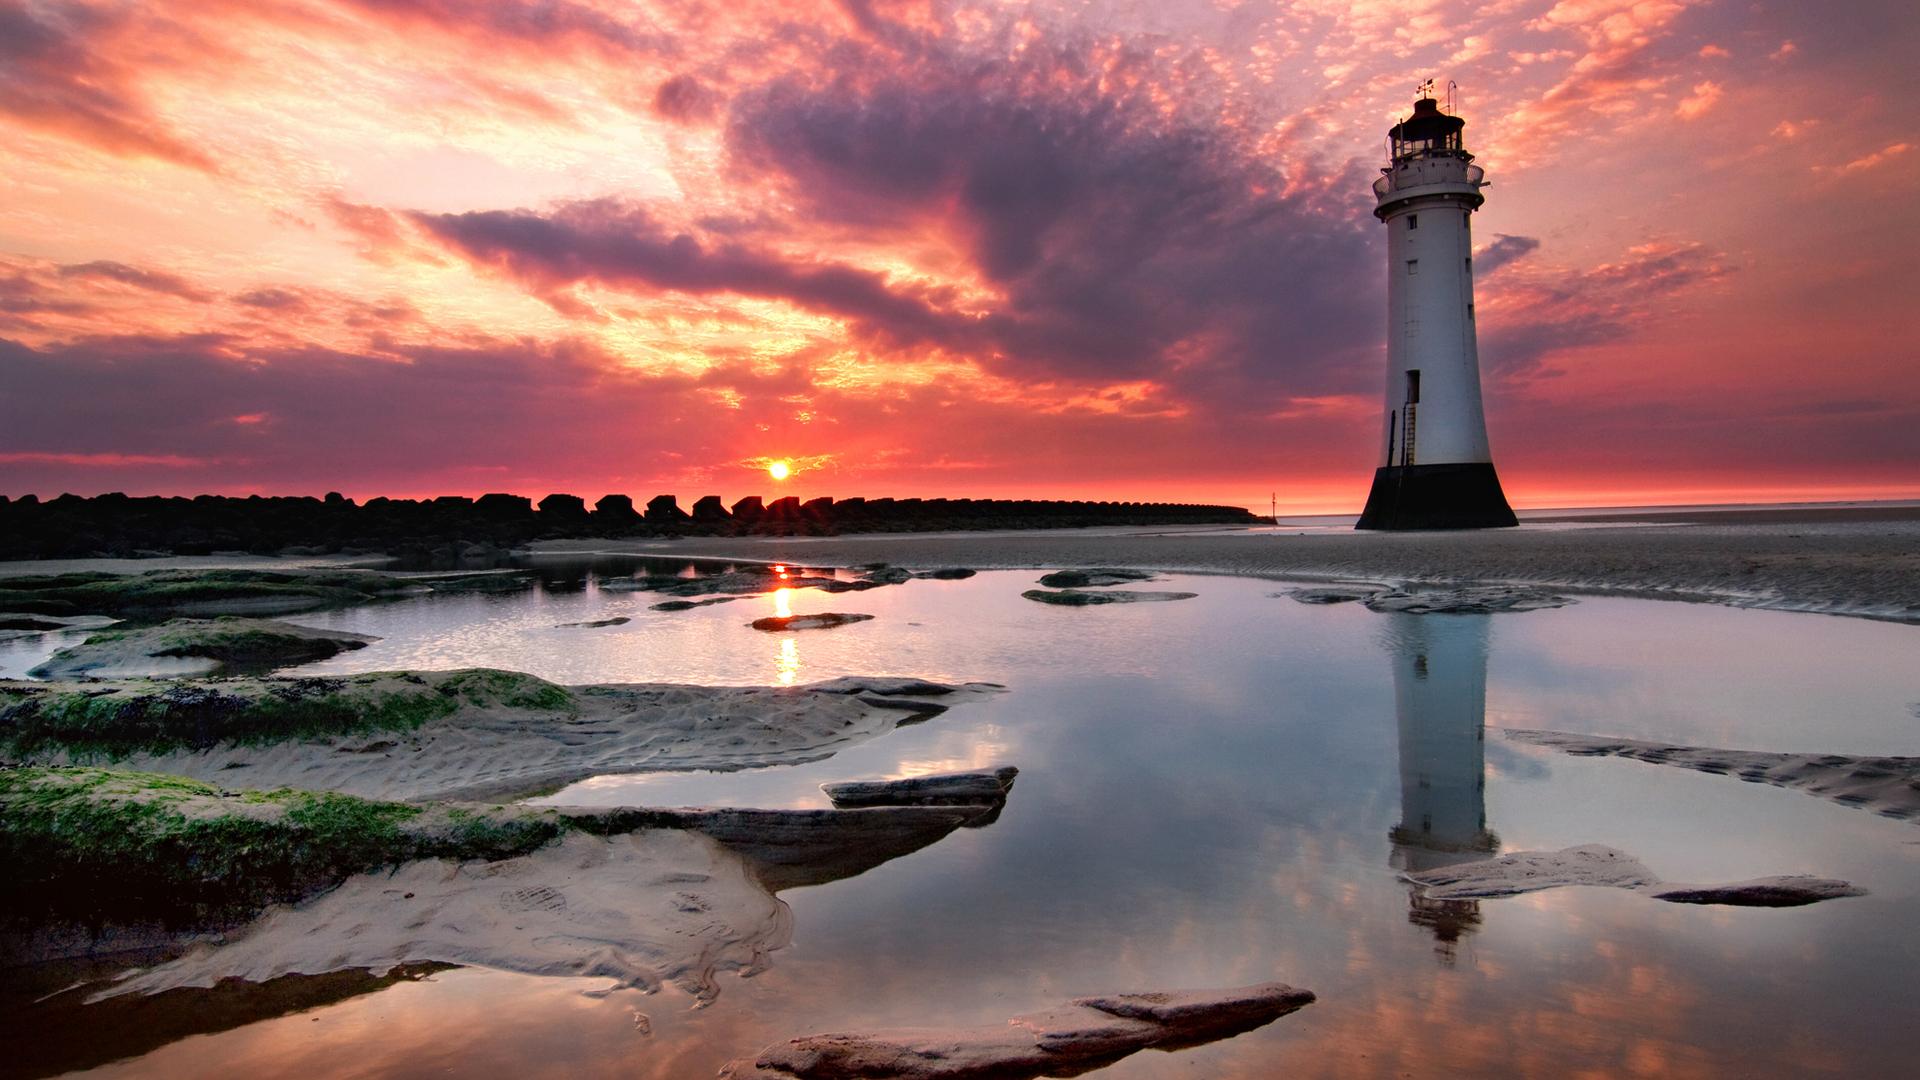 Картинки маяки на море, юбилеем лет